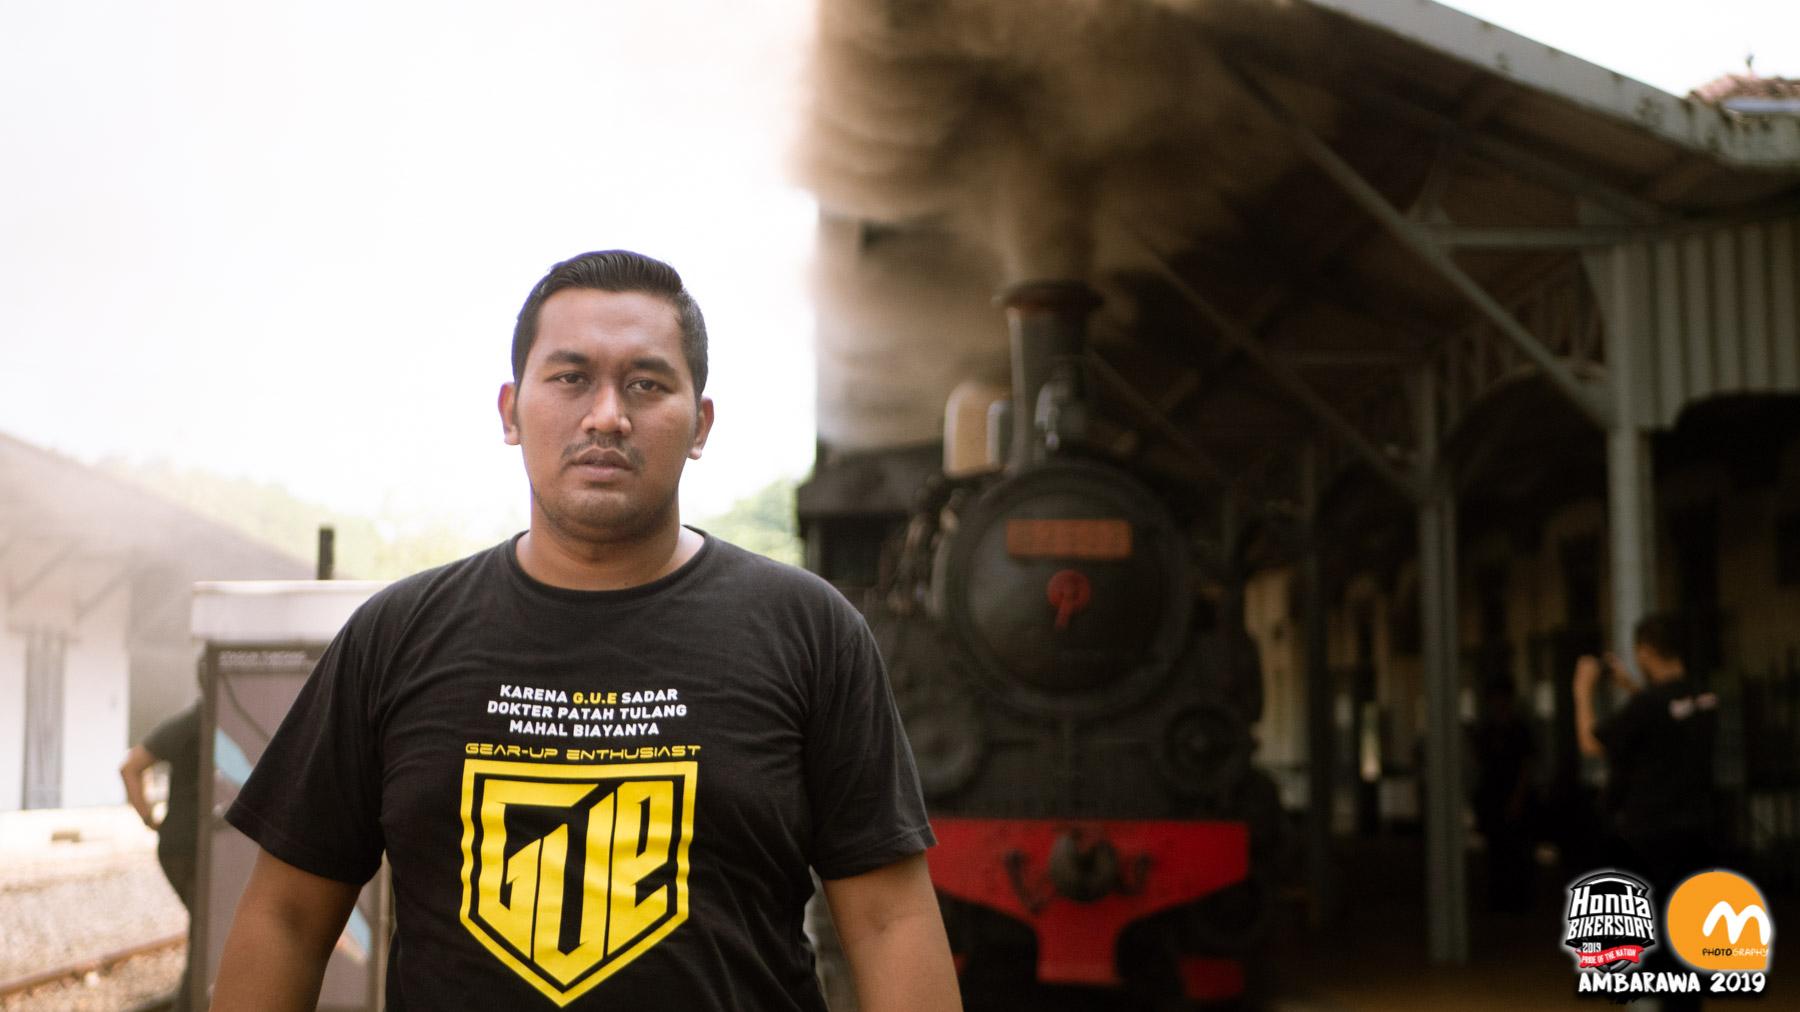 Naik kereta uap peninggalan Belanda di Ambarawa